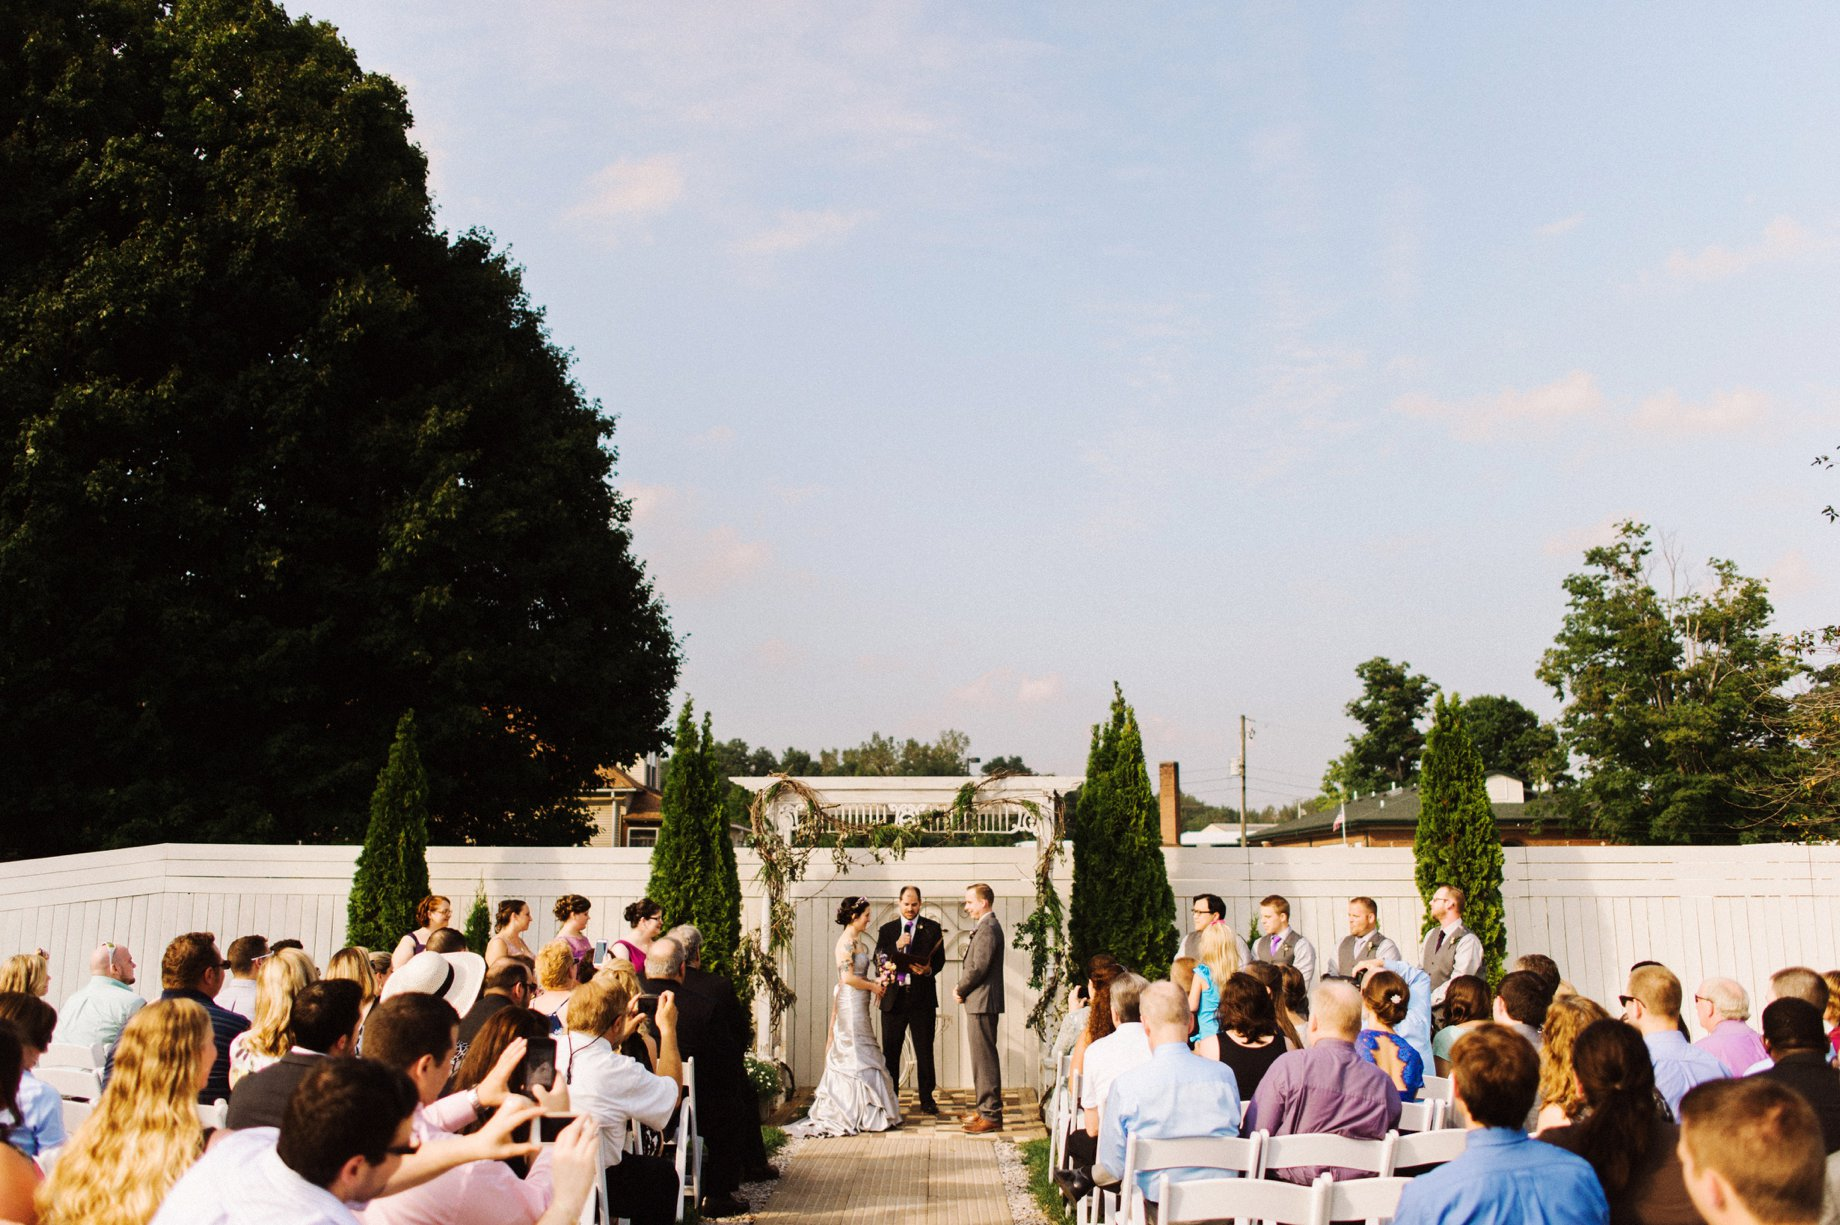 benton harbor wedding